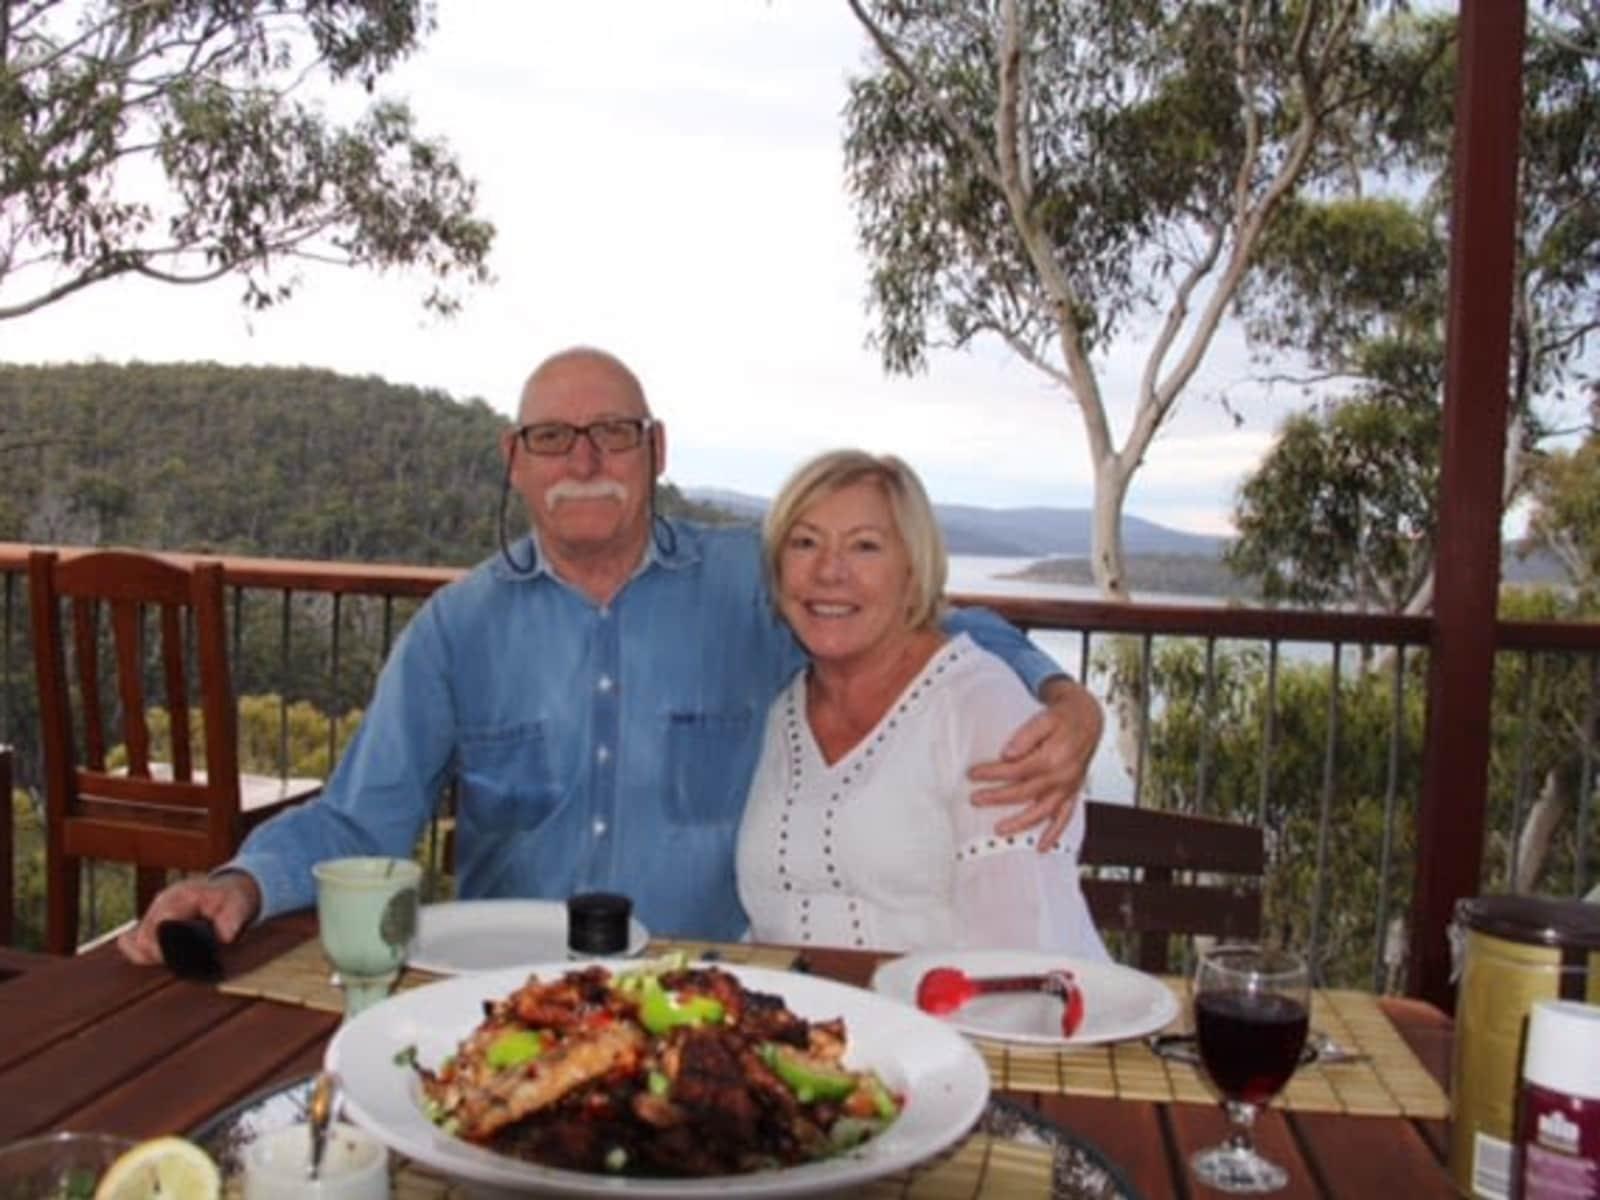 Ross & Jillian from Jindabyne, New South Wales, Australia